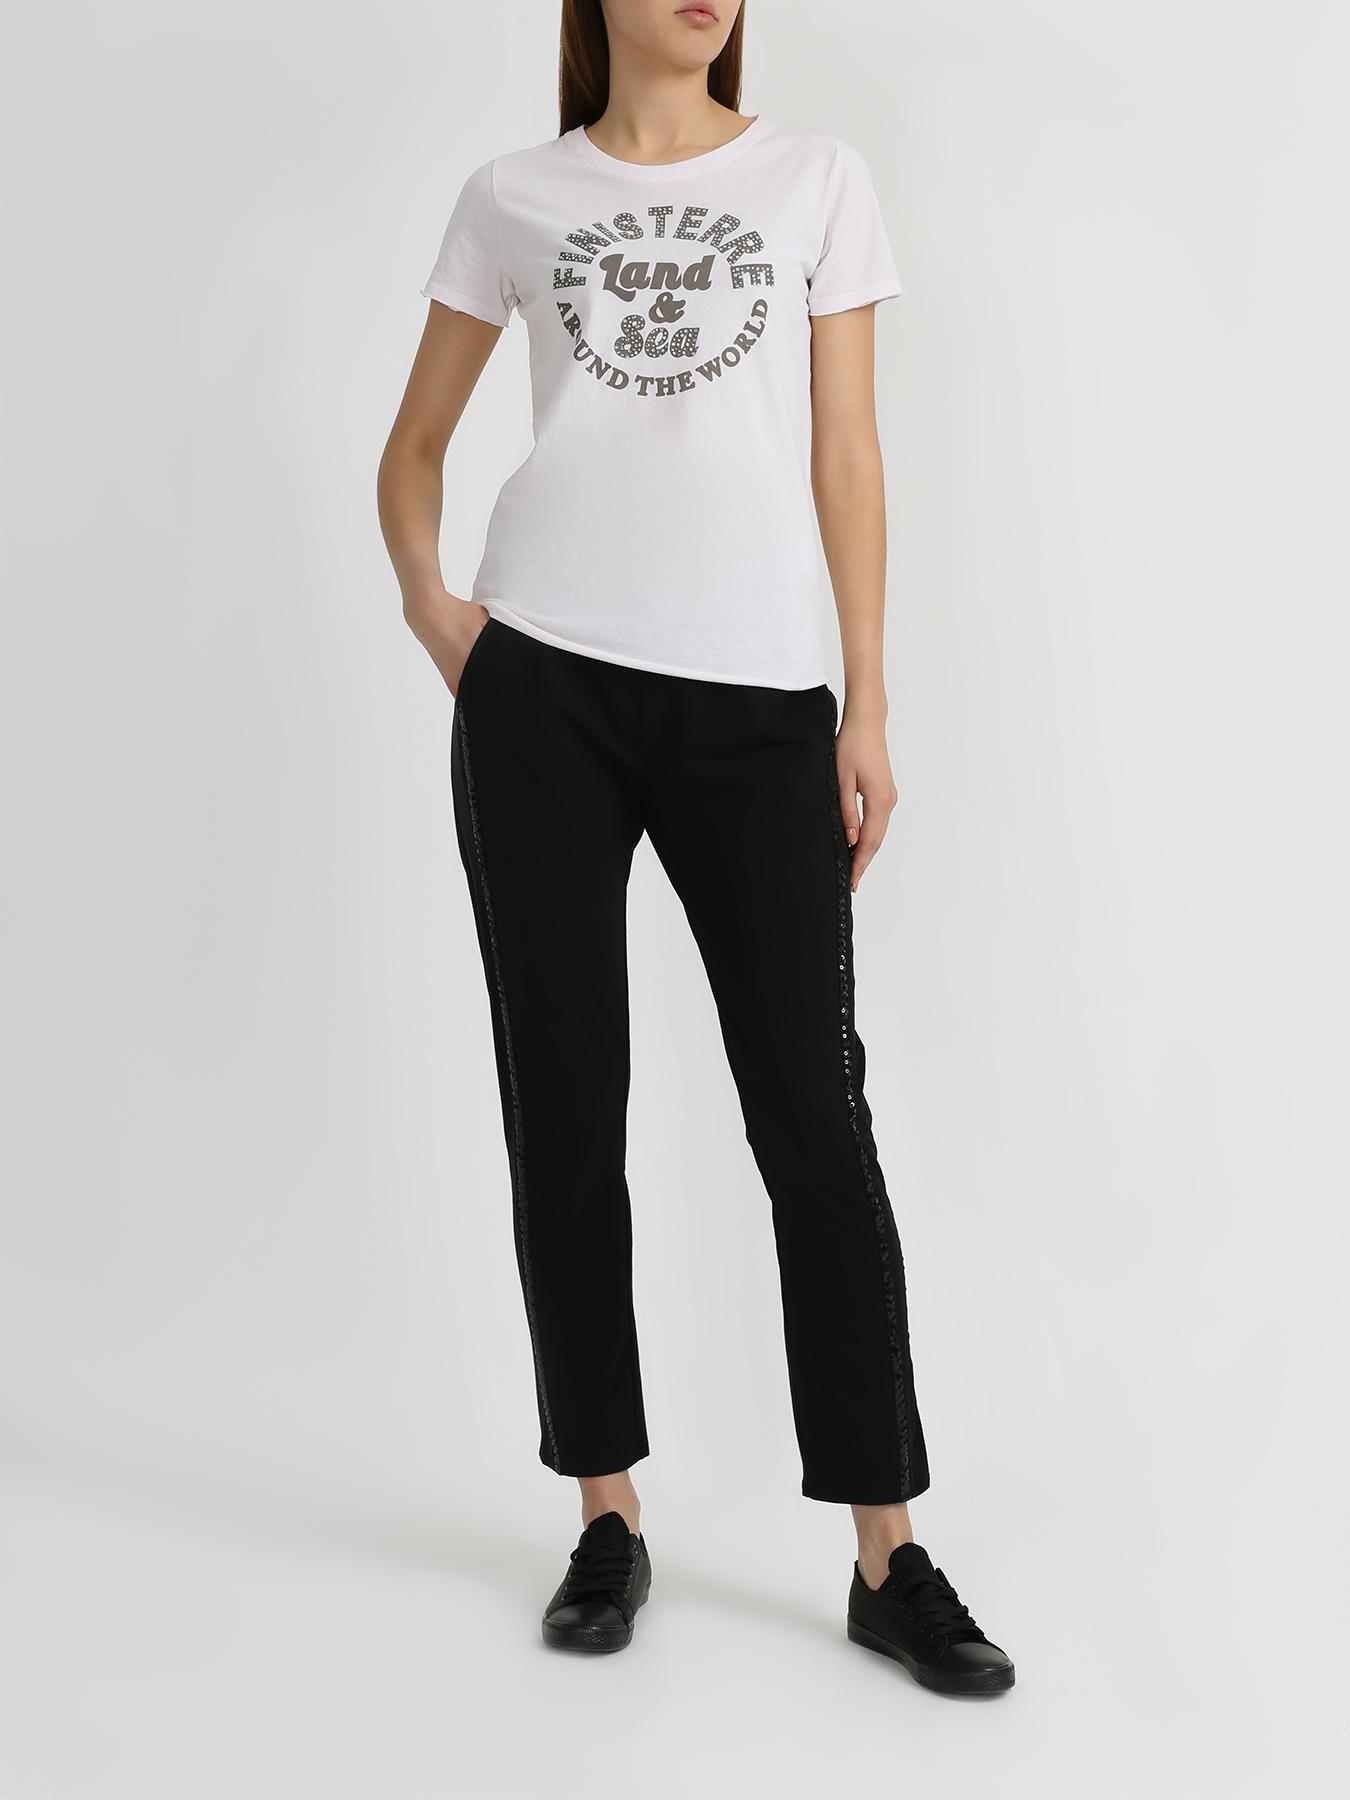 Finisterre Хлопковая футболка фото